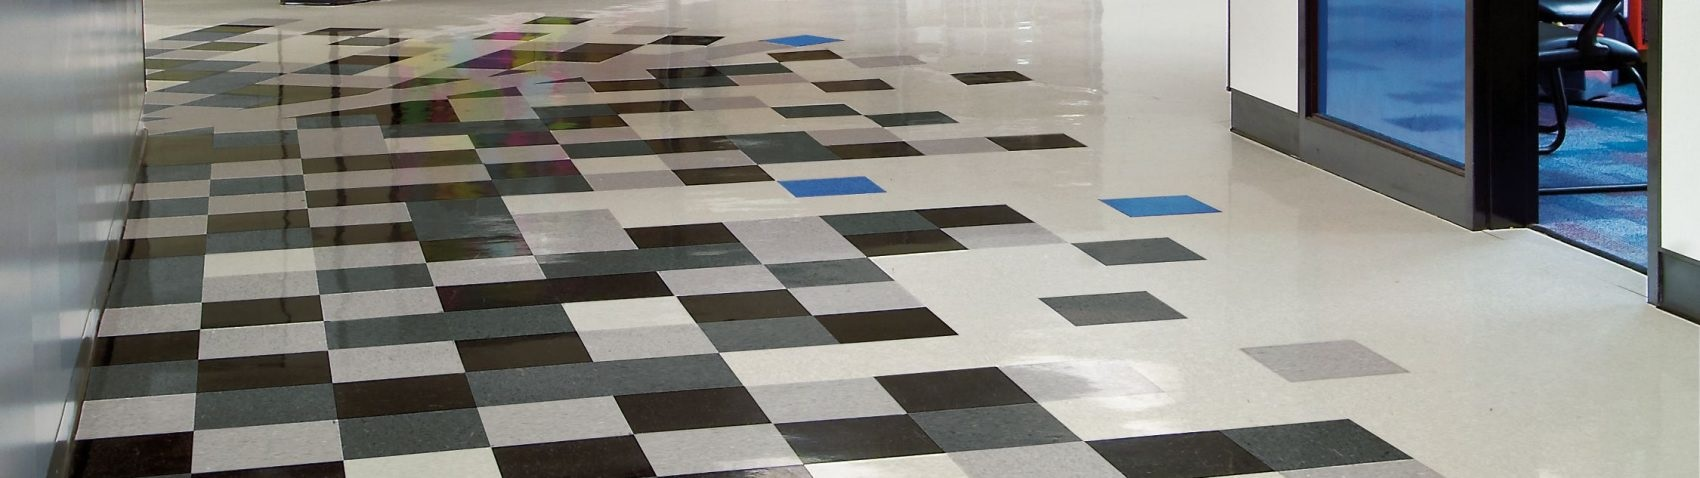 commercial vinyl composite tile banner